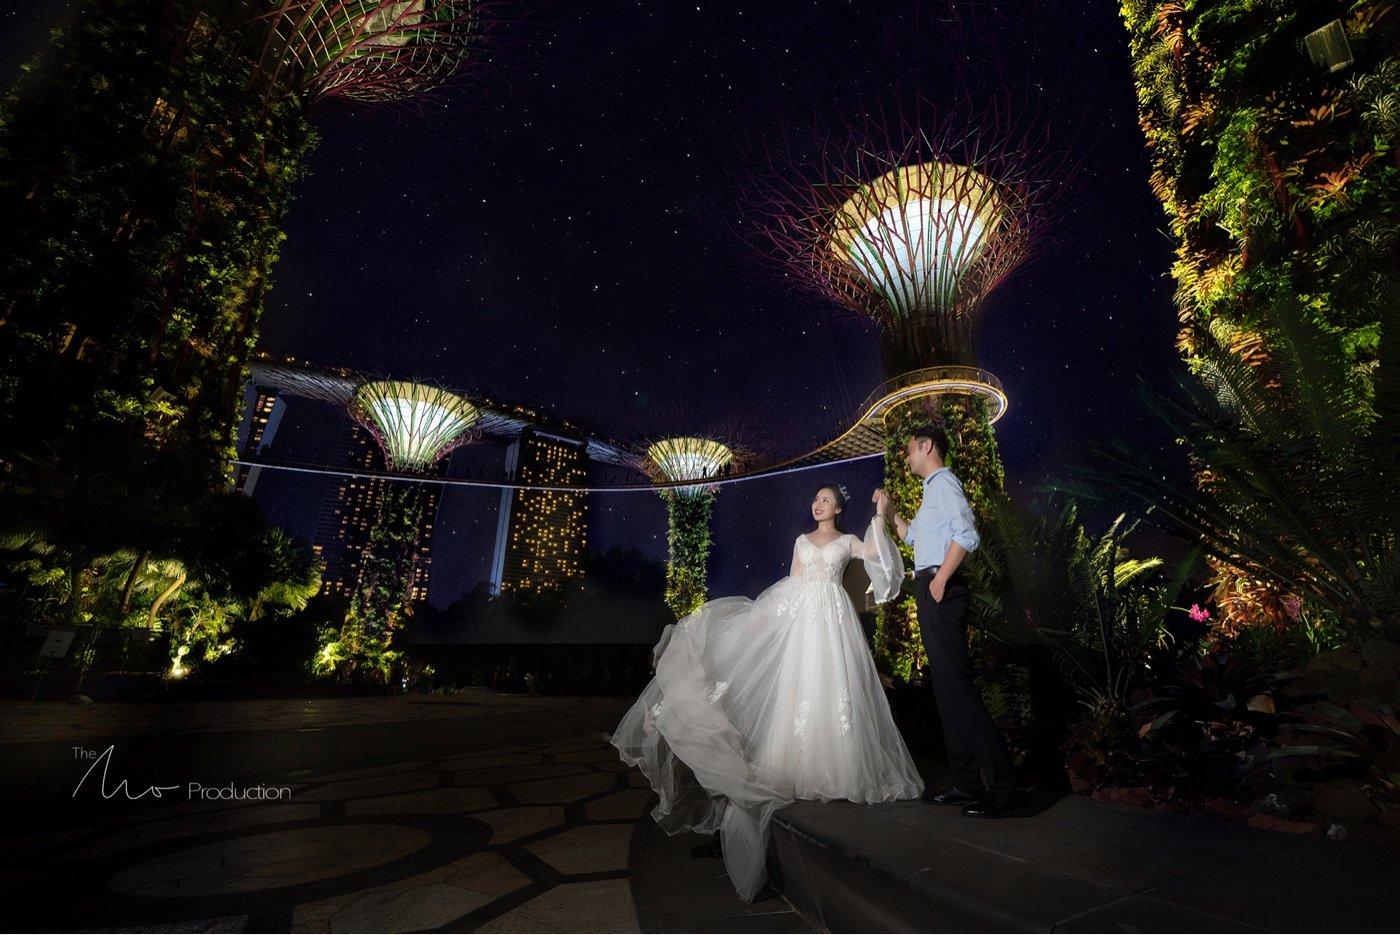 MoFoTo | 新加坡旅拍婚纱13